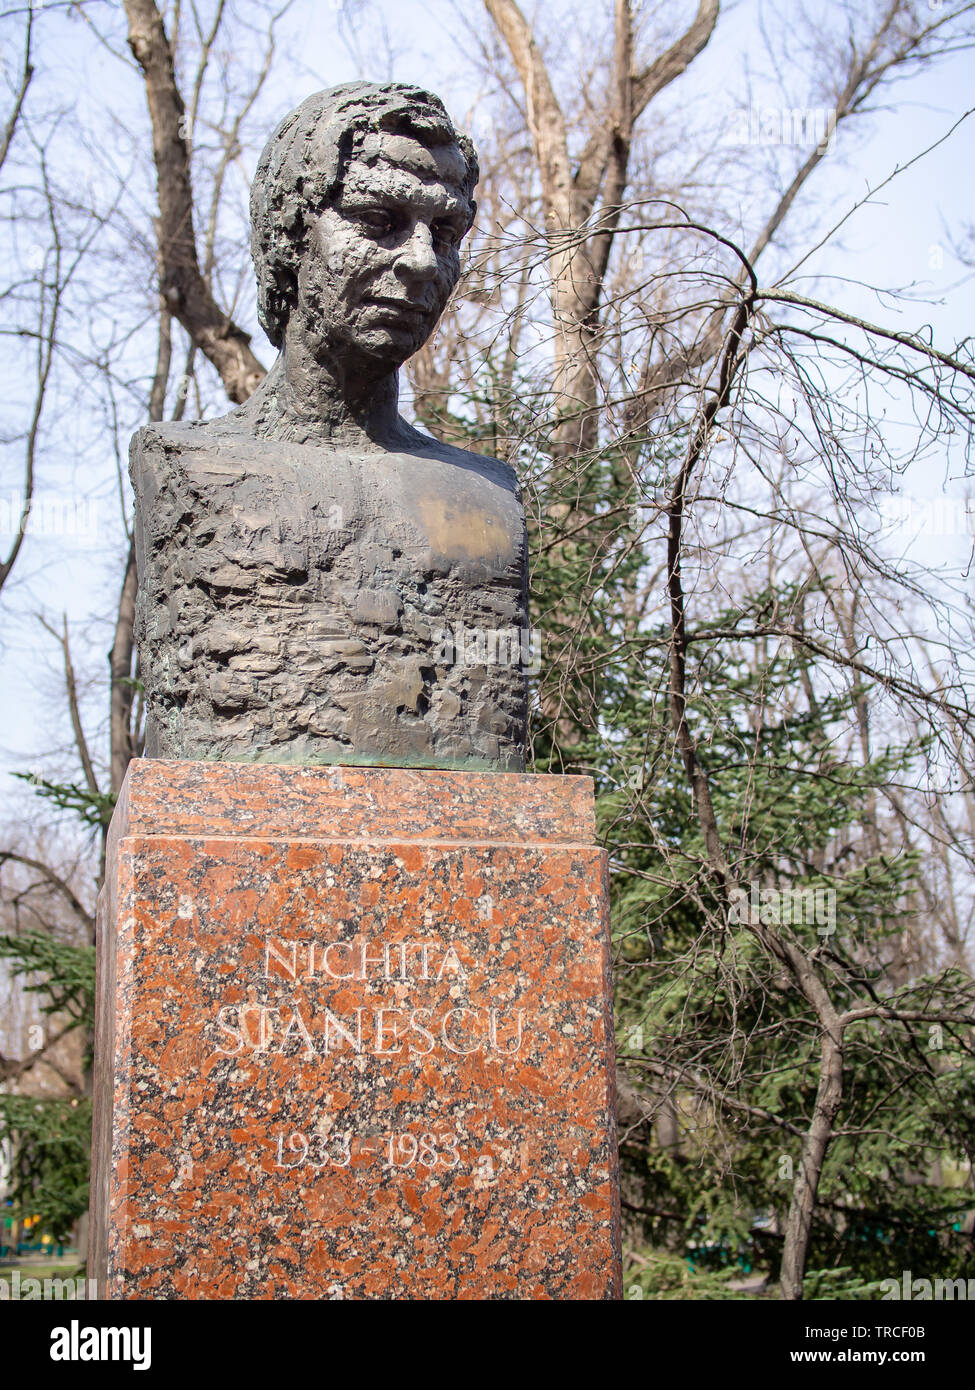 CHISINAU, MOLDOVA-MARCH 21, 2019: Nichita Stanescu bust in the Alley of Classics - Stock Image